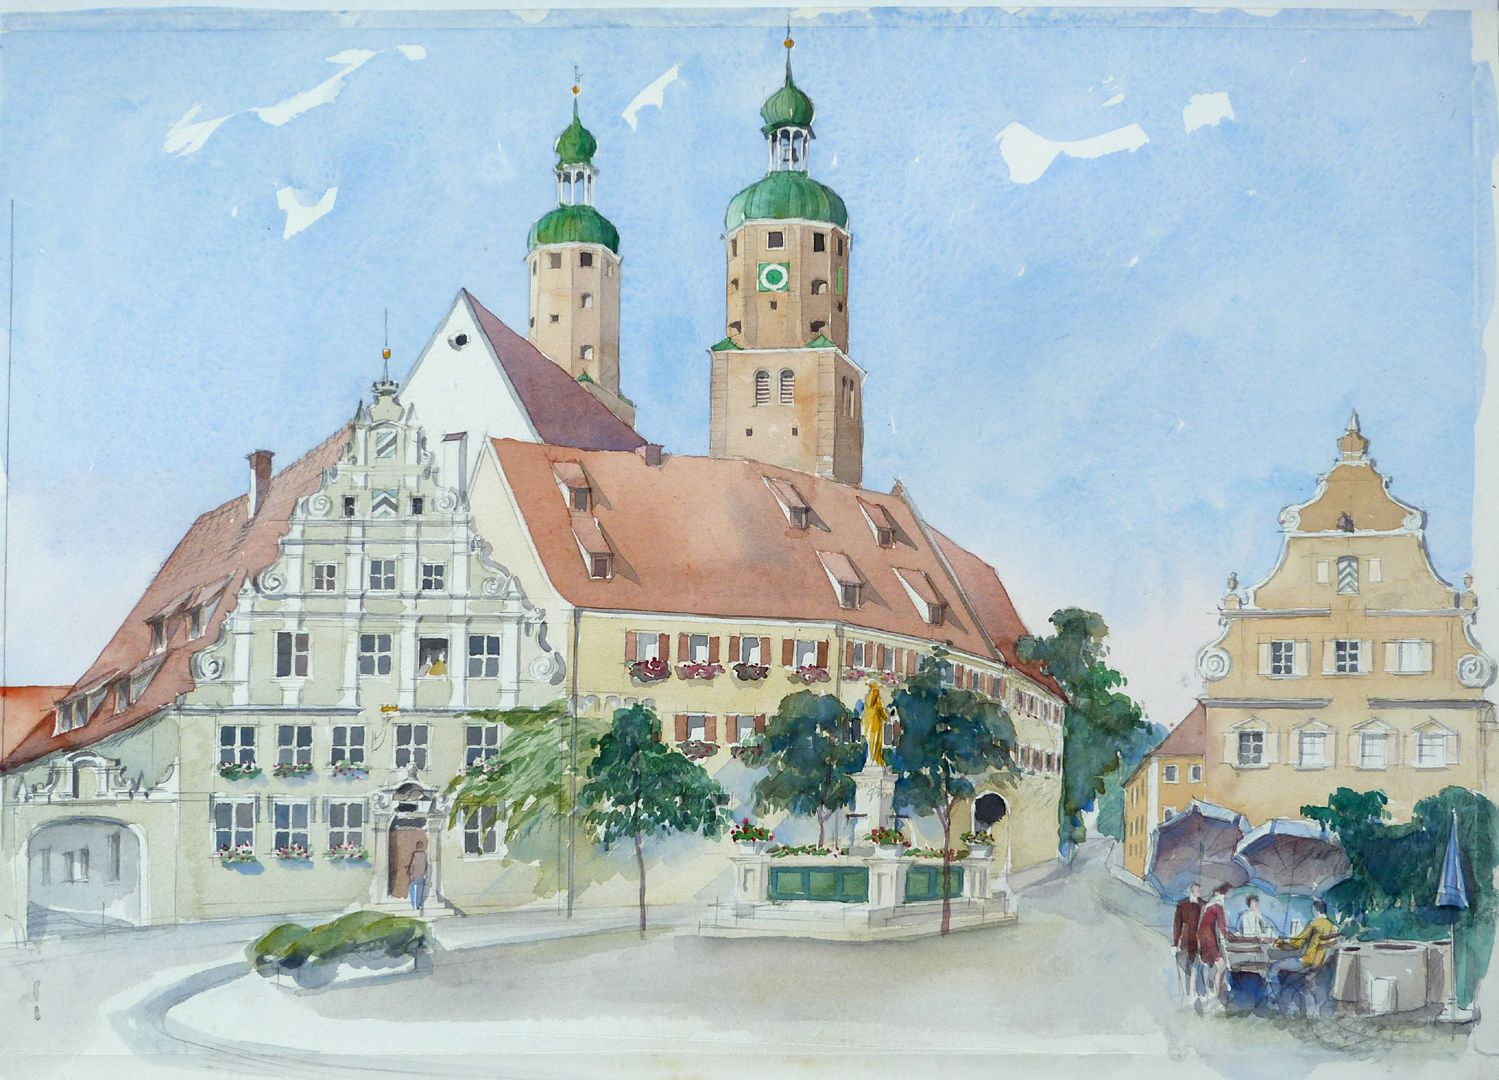 Wemding (district Donau-Ries City Hall on the market place with catholic parish church St. Emmeram´s